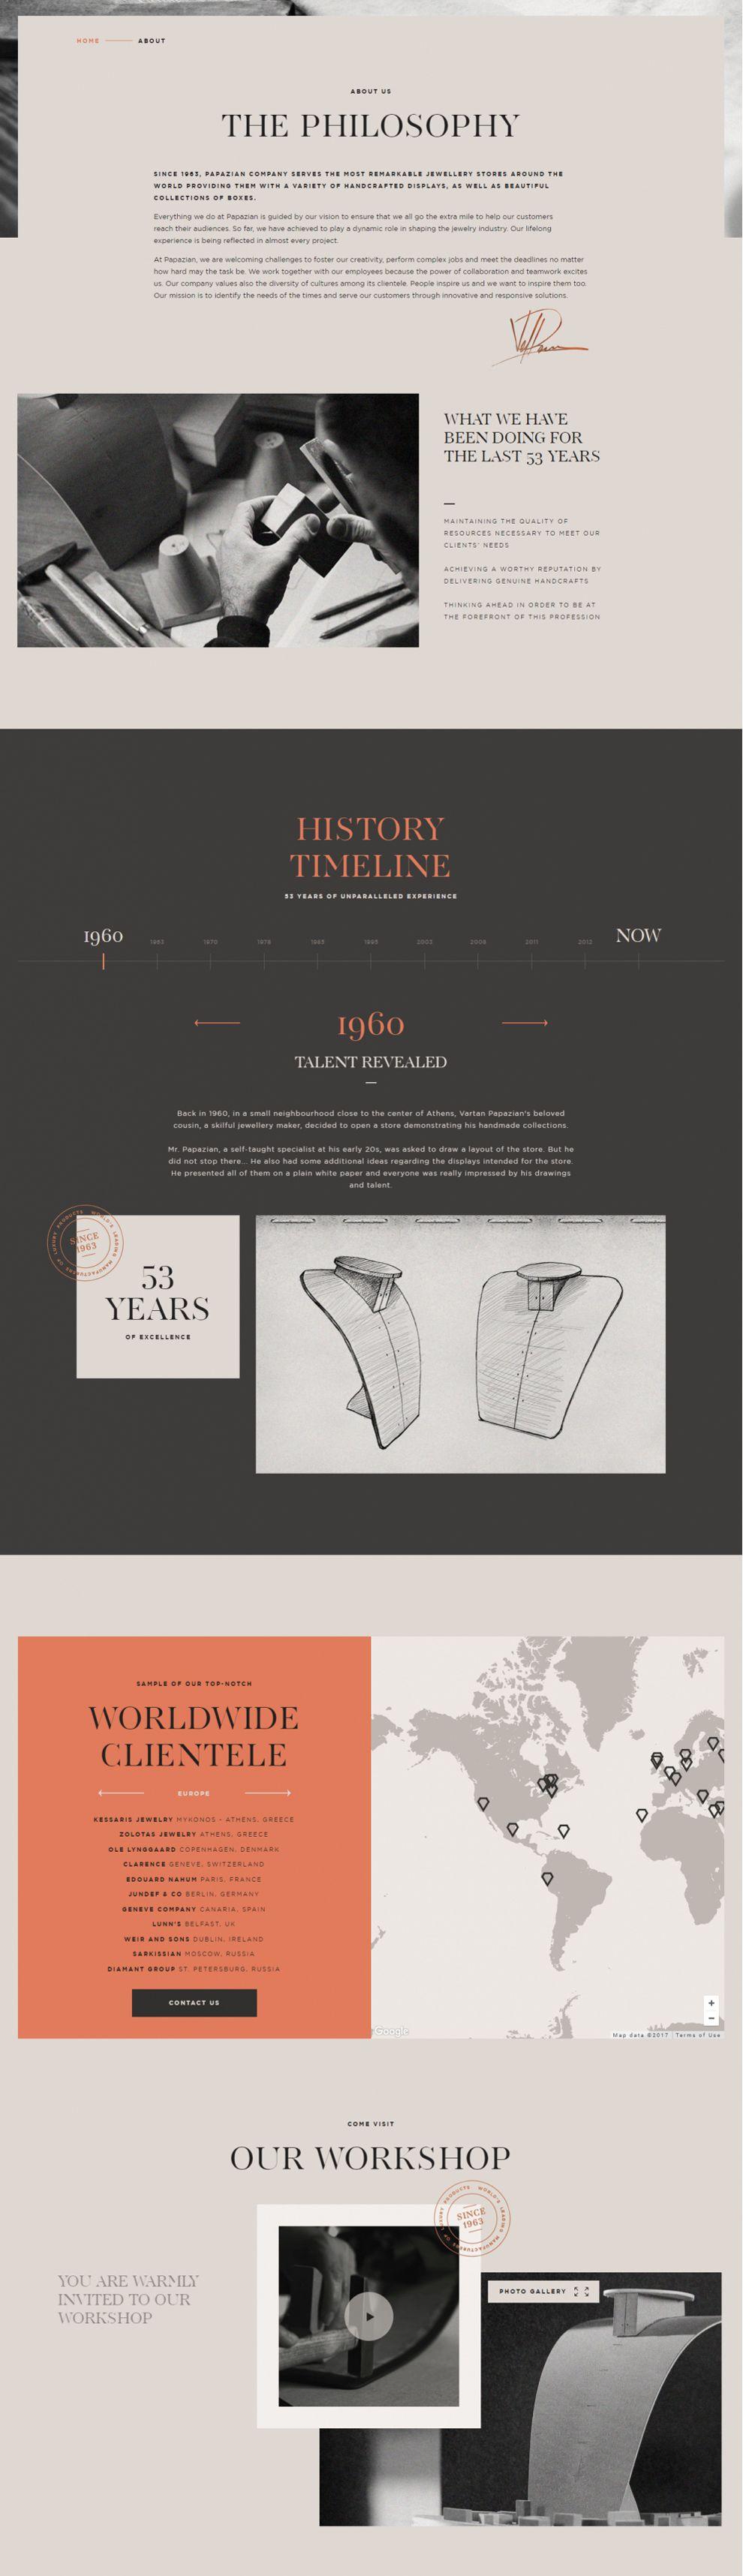 Packaging Papazian Amazing Website Design